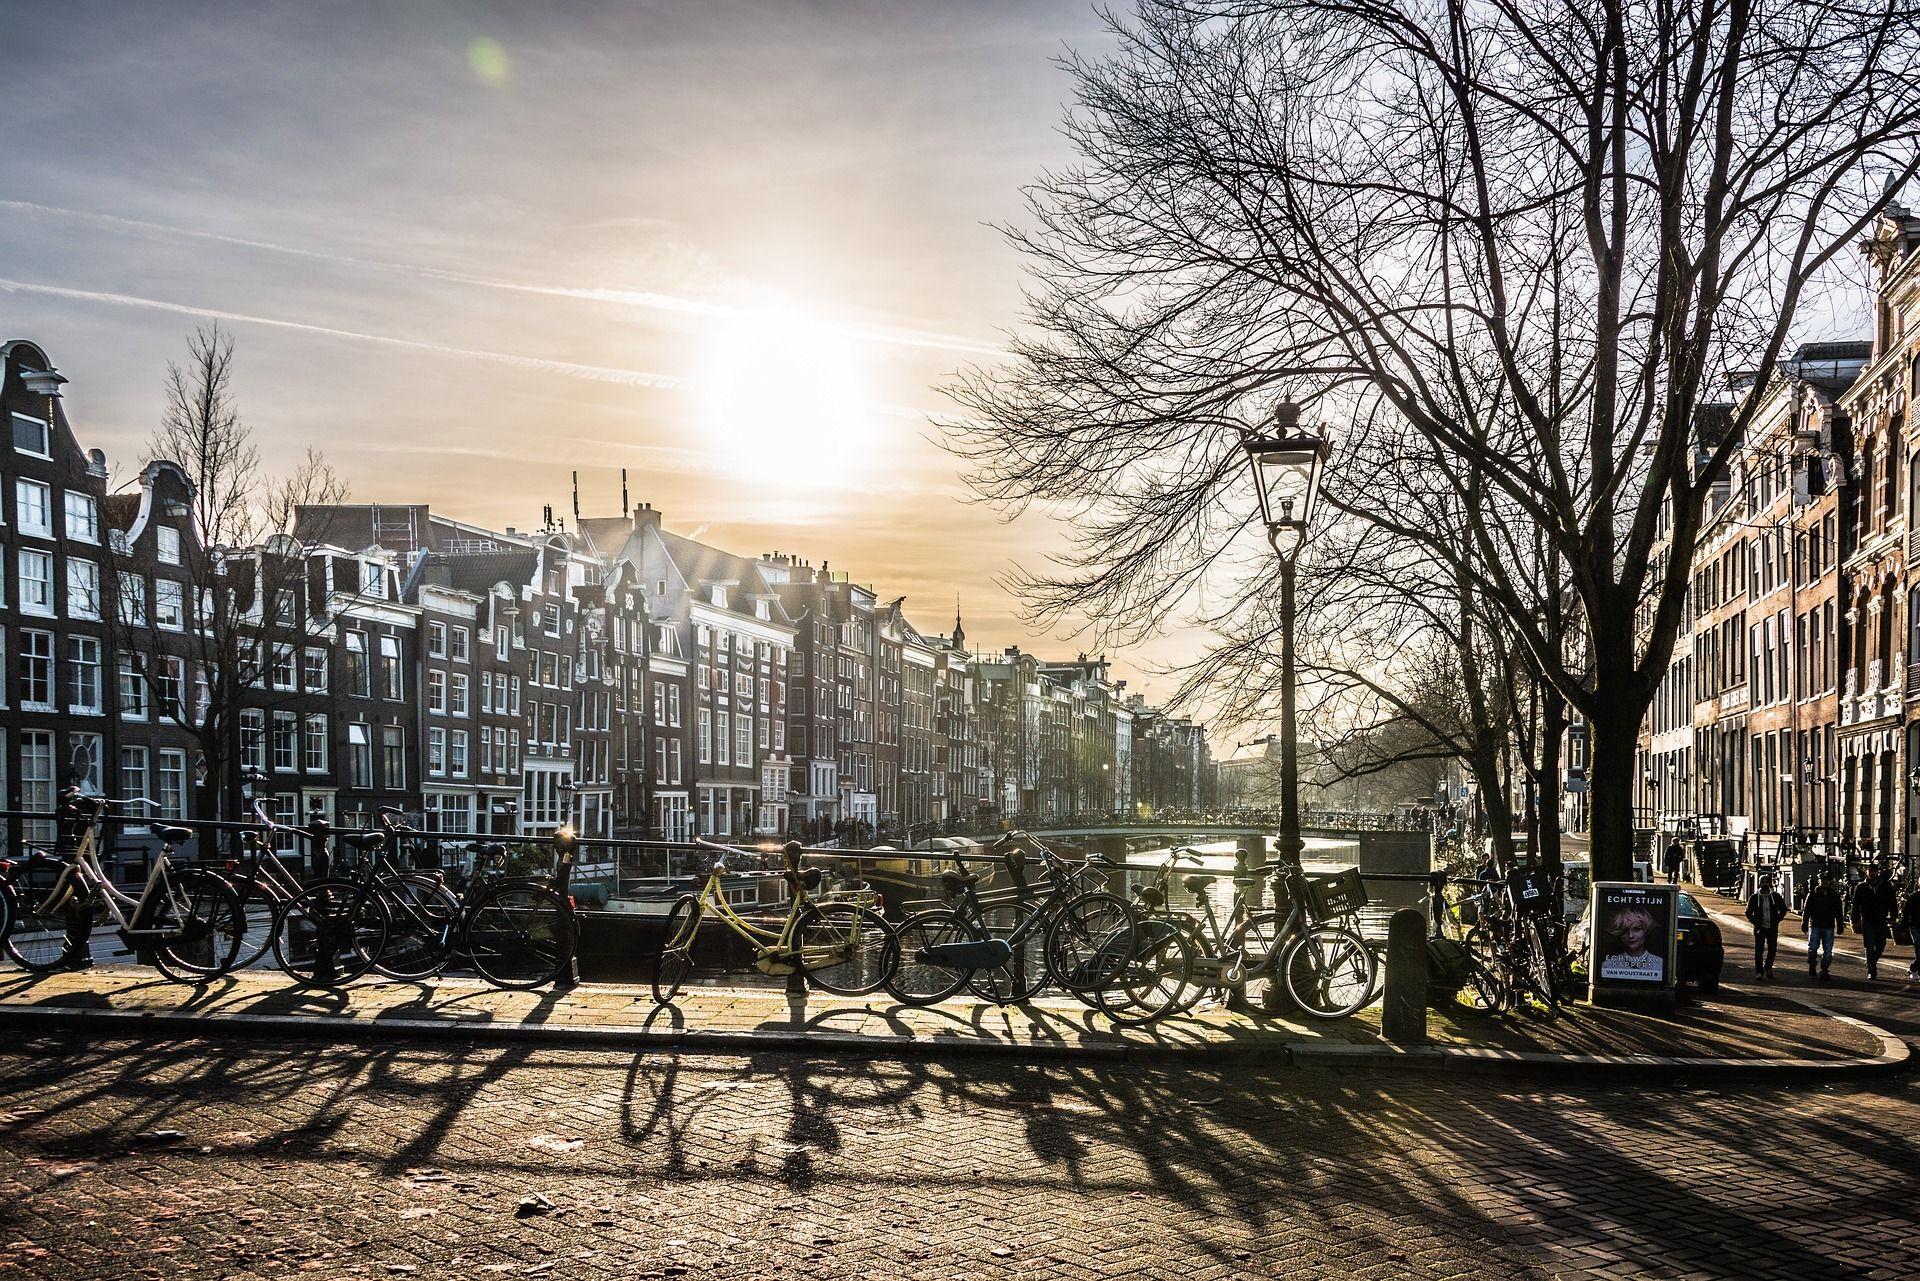 Amsterdam.rb